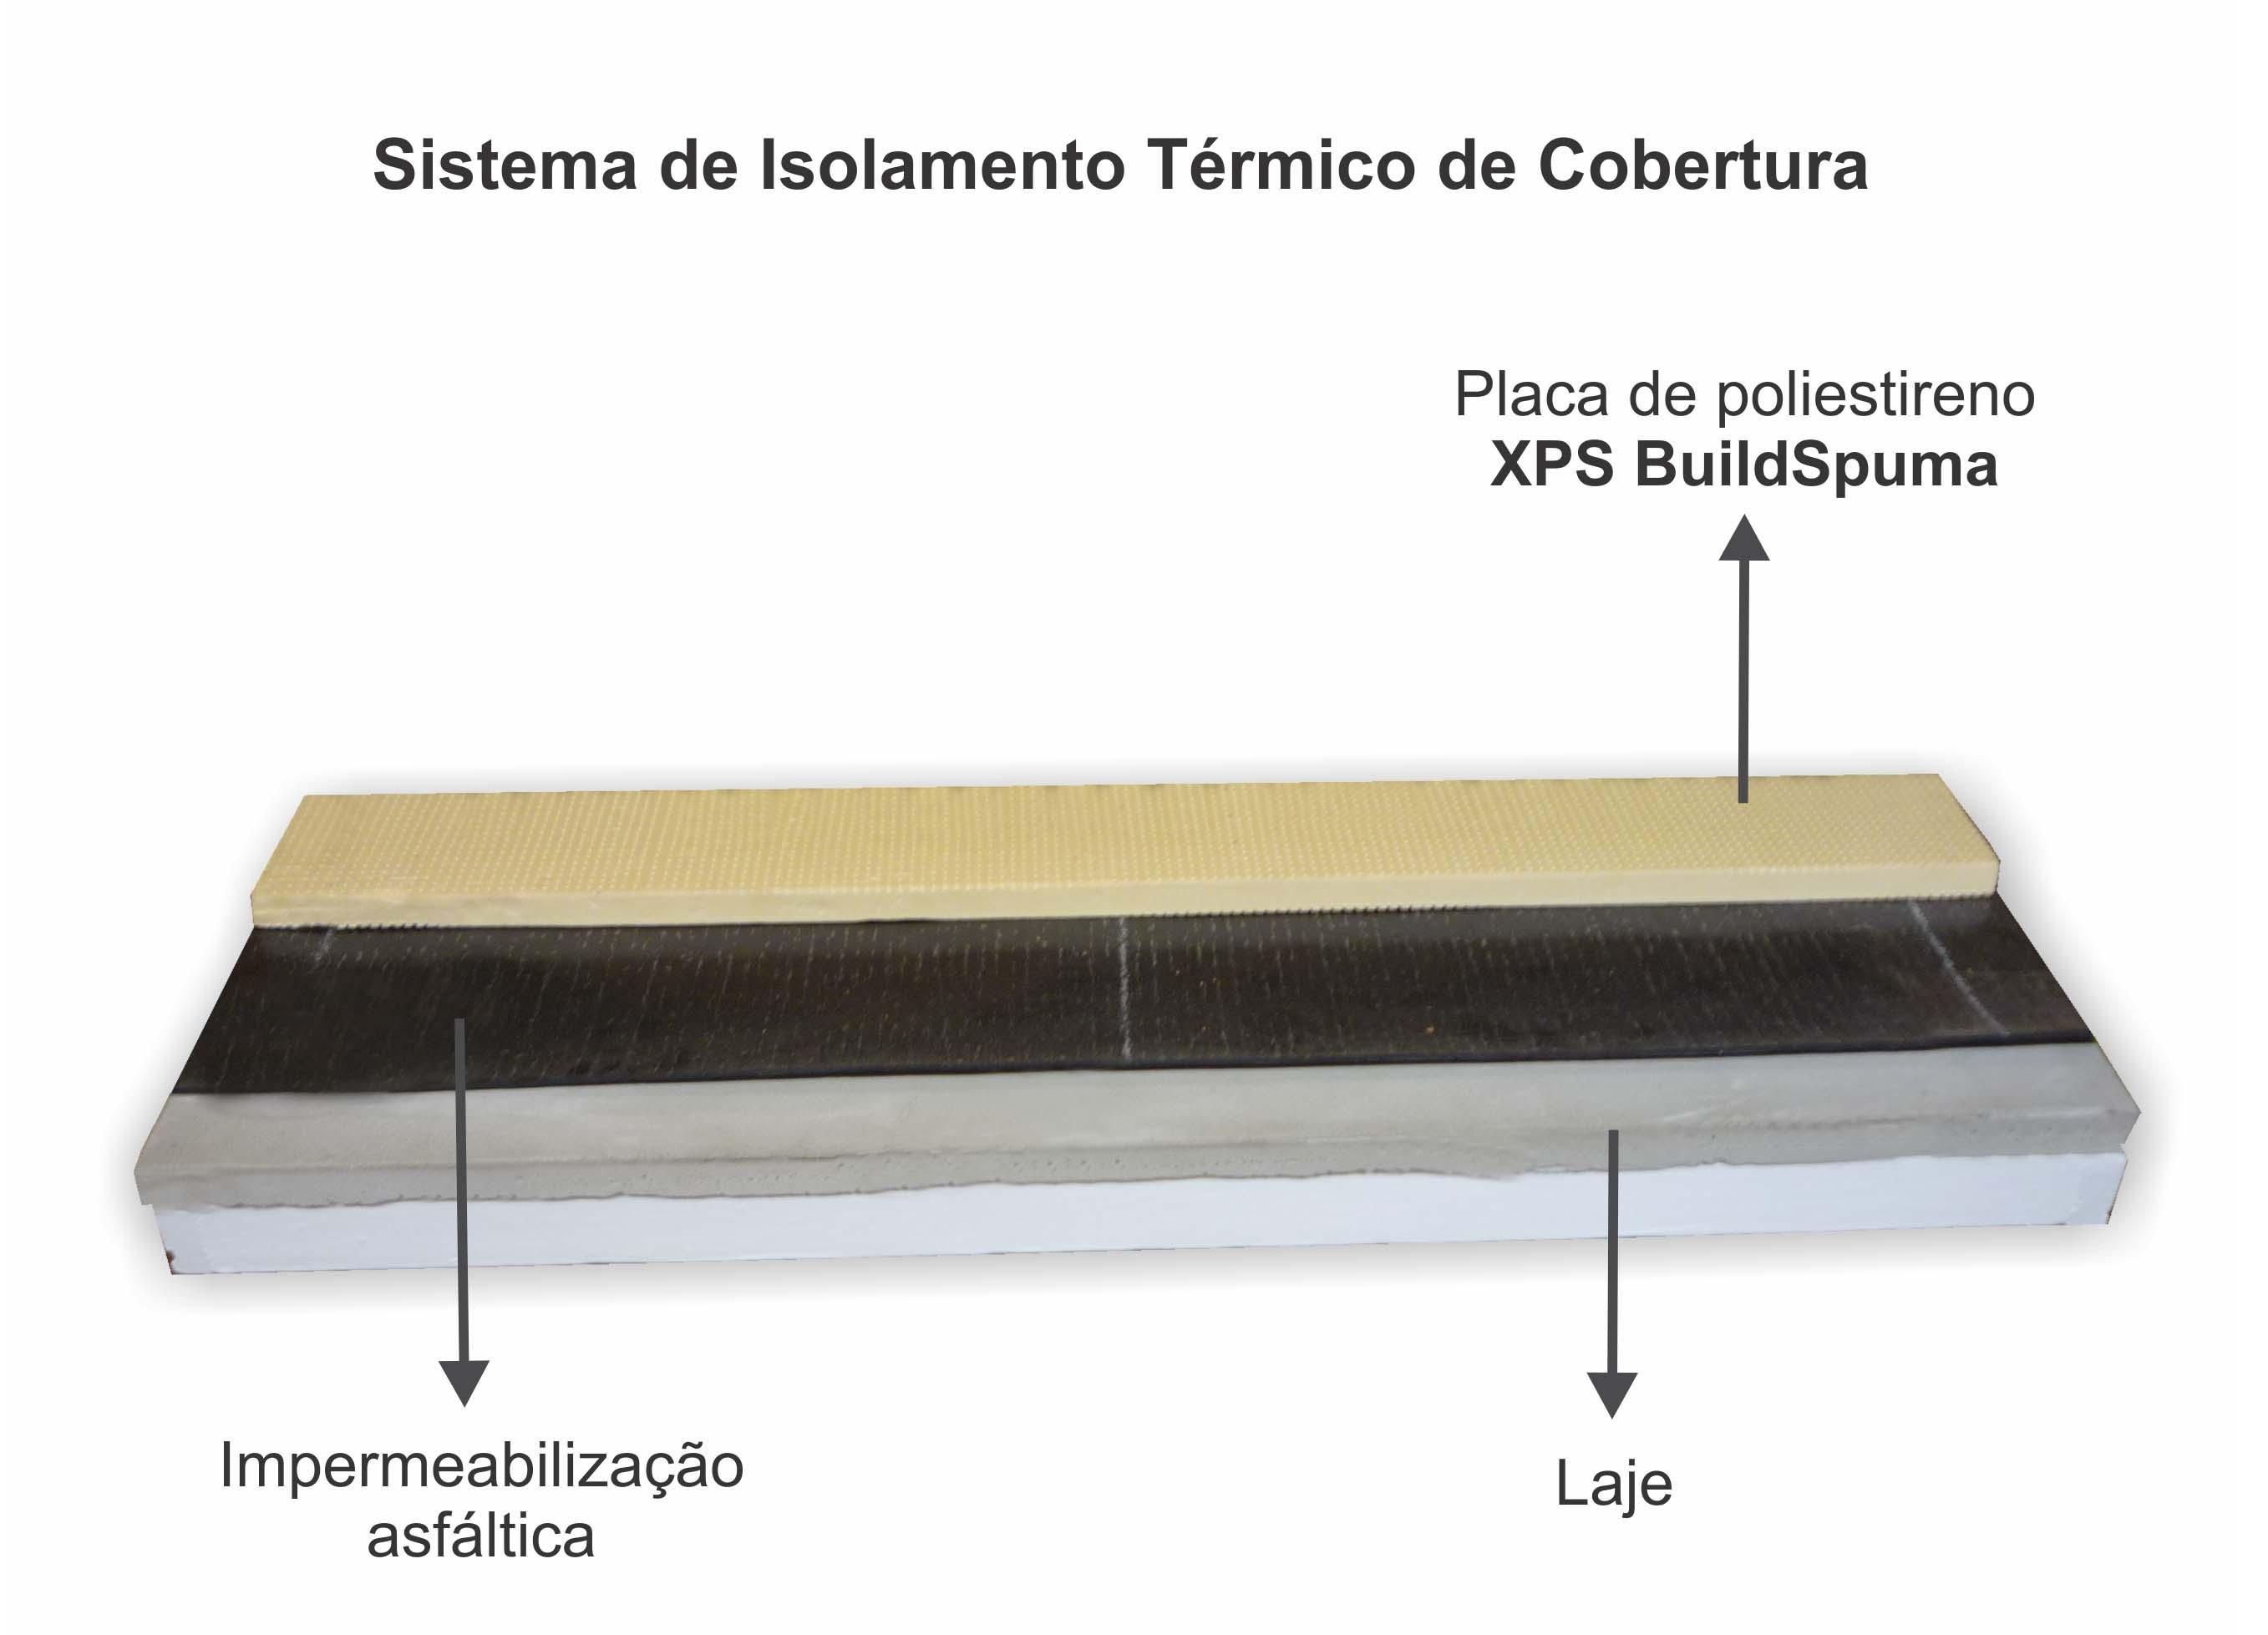 Isolamento t rmico xps buildspuma show pagina - Placa de poliestireno ...